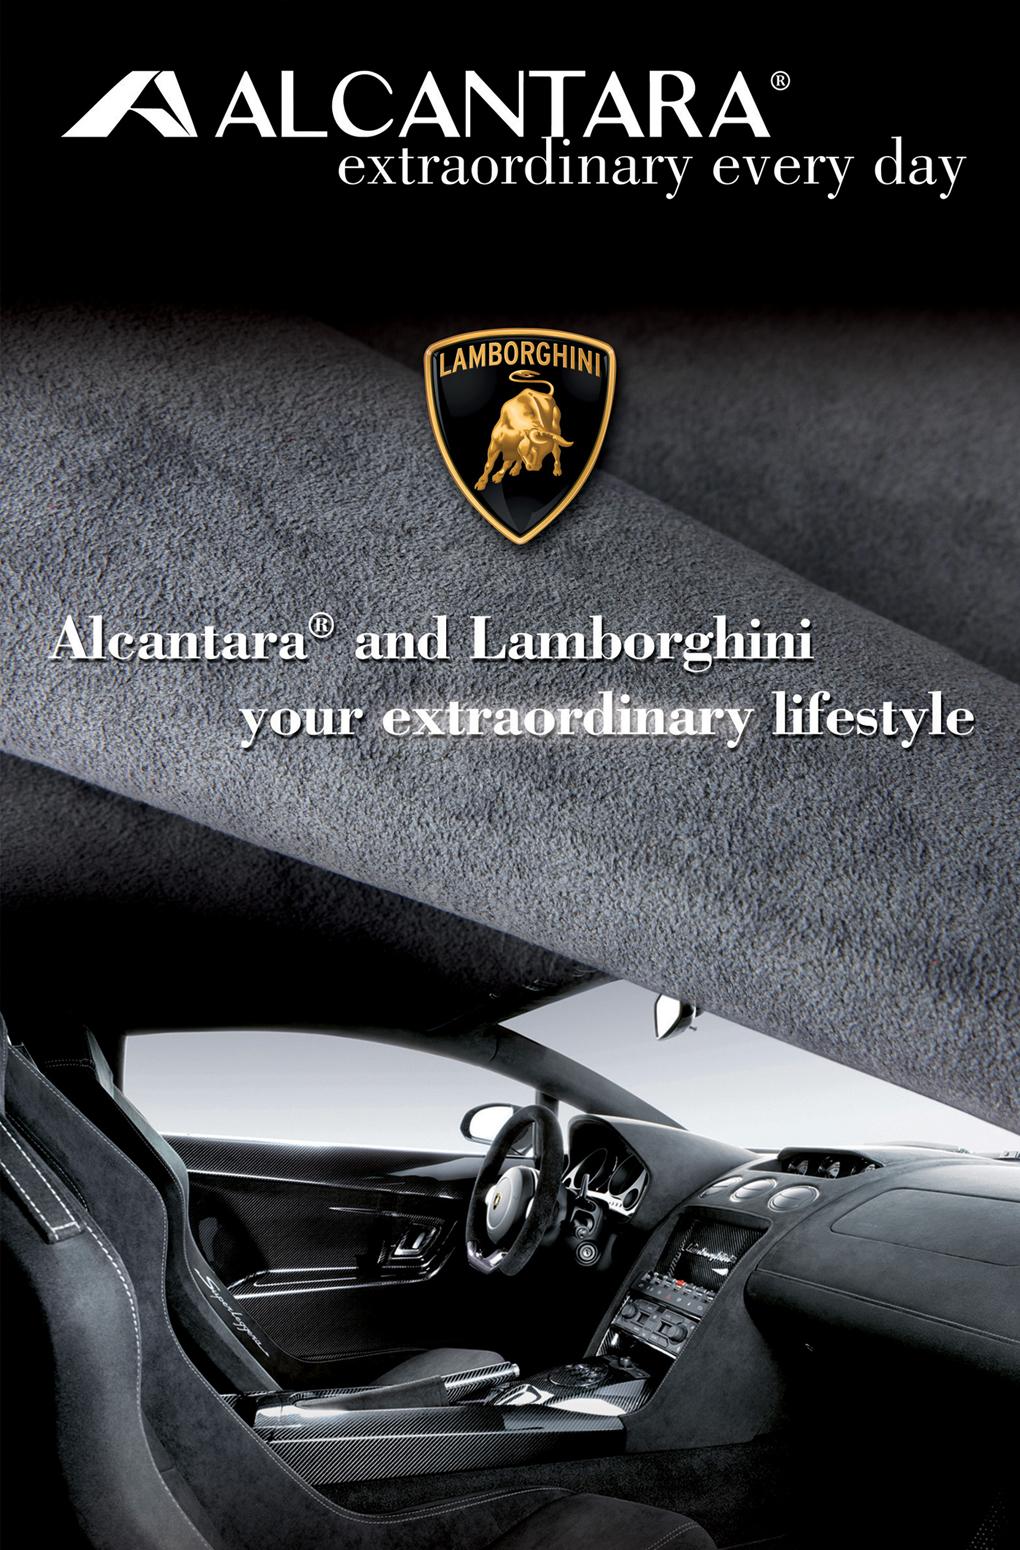 Campagna lancio Alcantara a Shanghai feauring Lamborghini - Graphic Design Mirko Neri